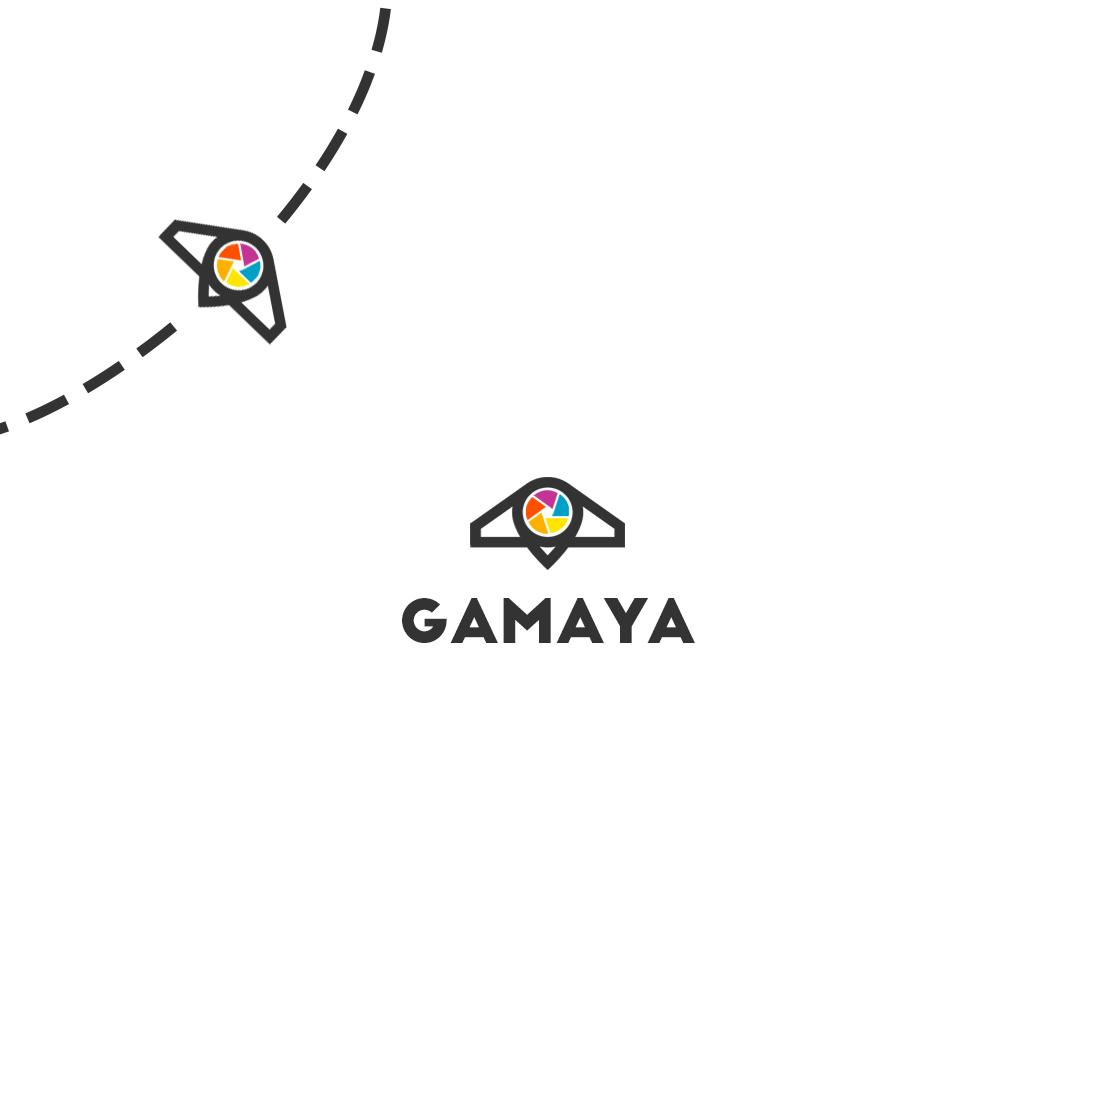 Разработка логотипа для компании Gamaya фото f_82354842c2f18bfe.jpg